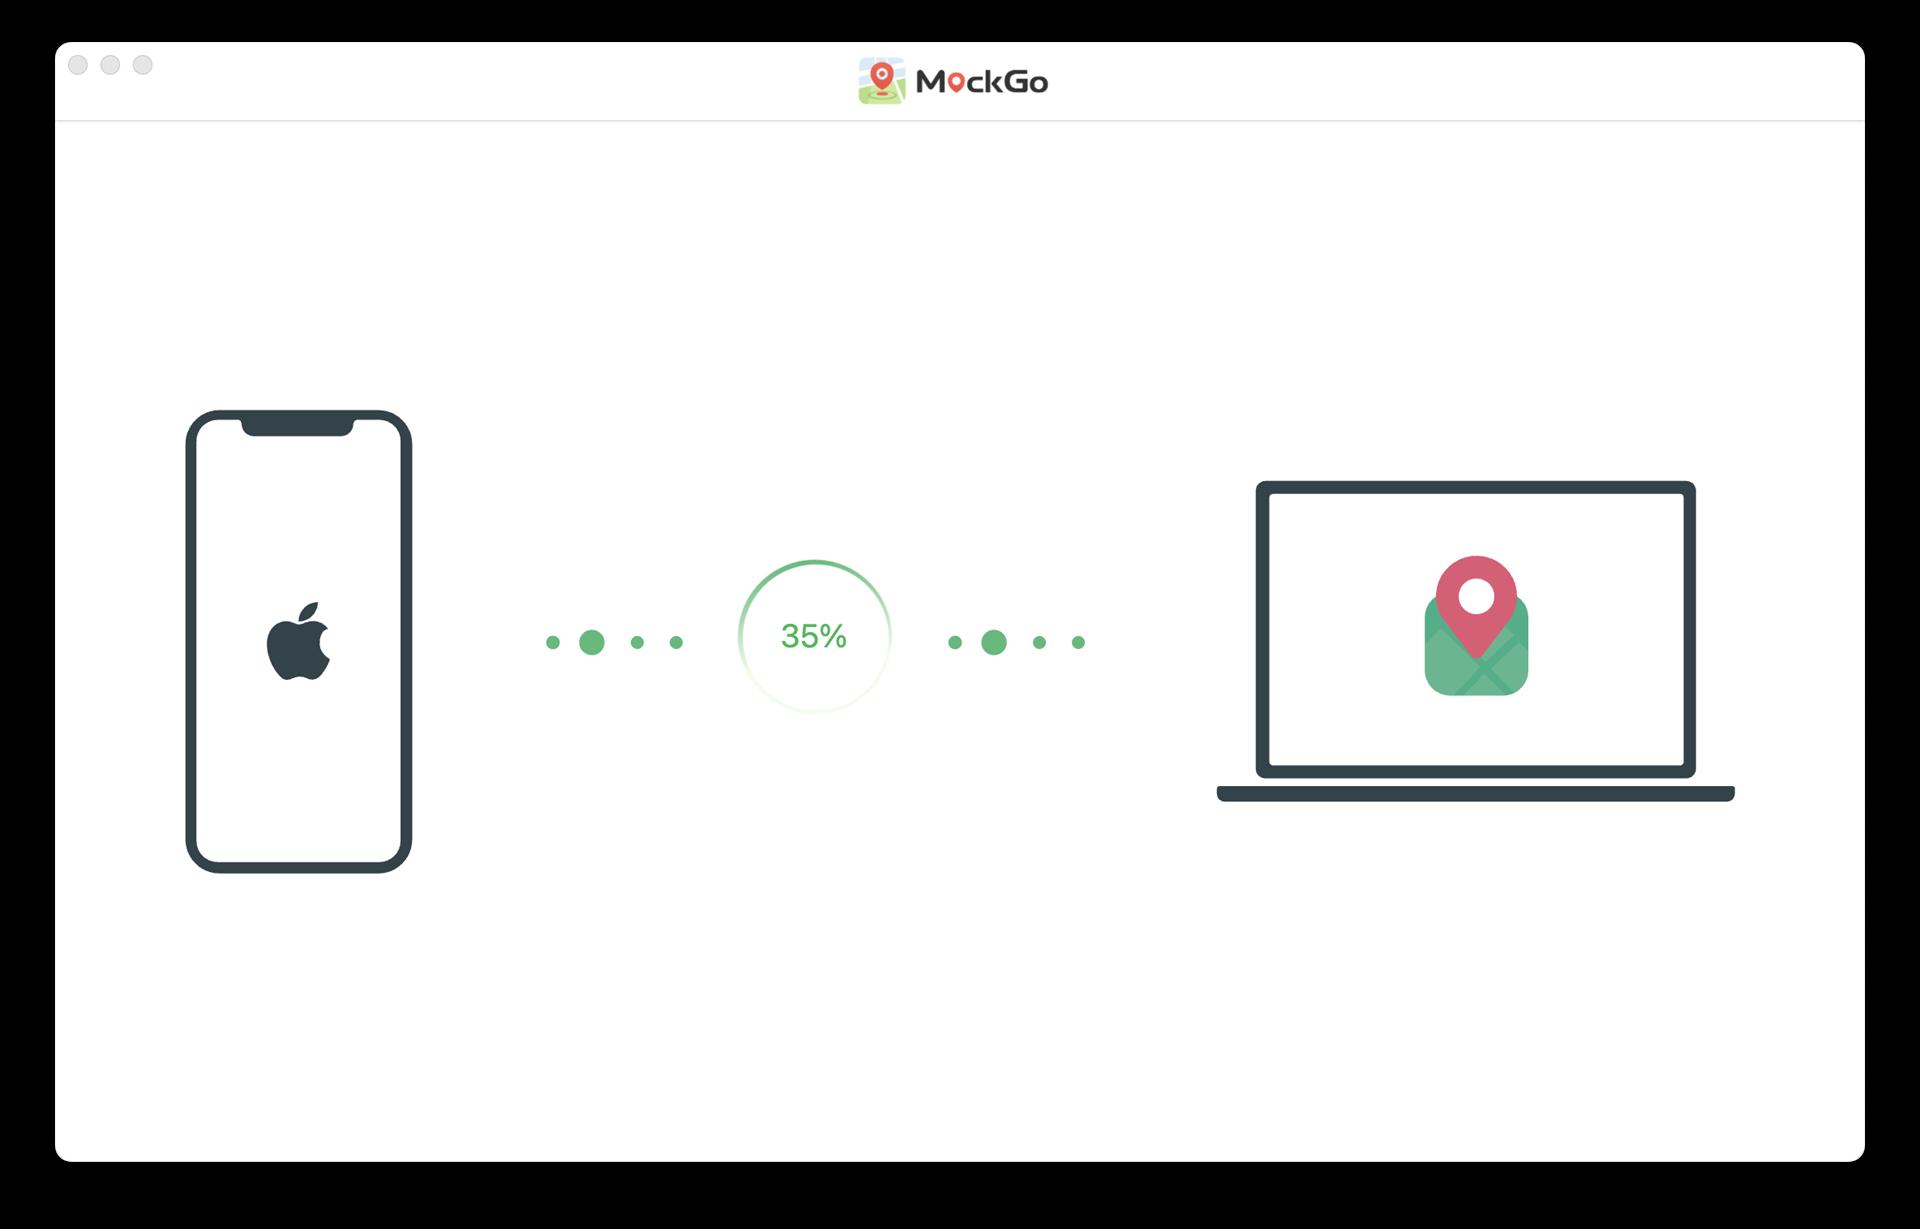 MockGo, Privacy Software Screenshot